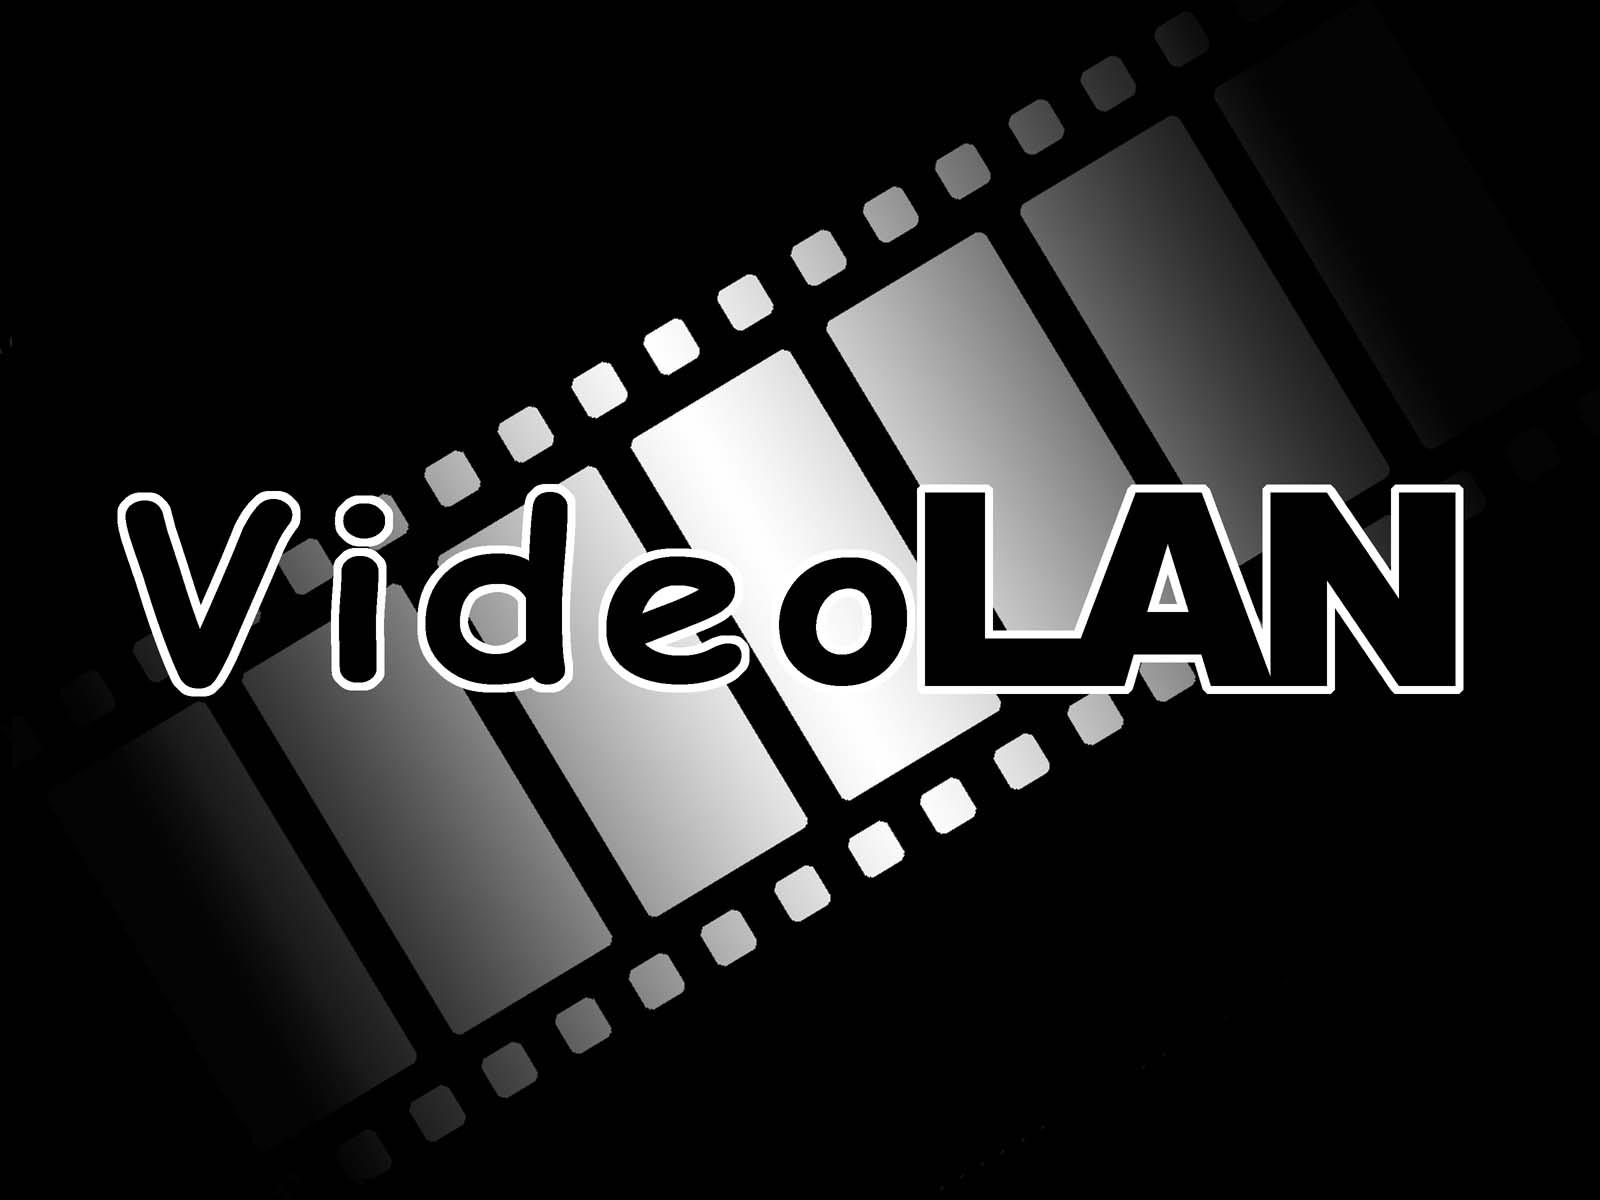 www.videolan.org/images/goodies/videolan/vl3_1600x1200.jpg